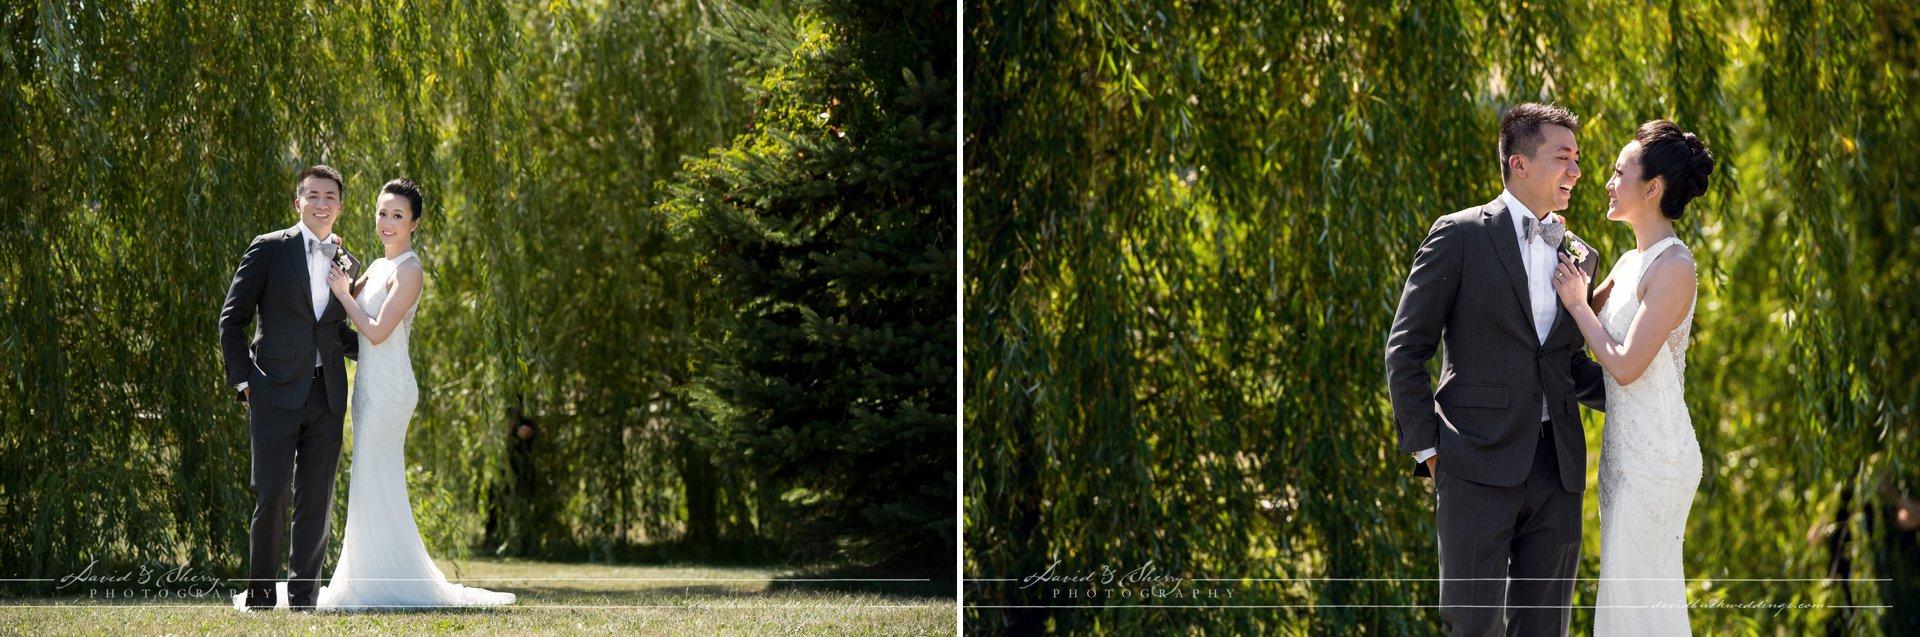 waterstone-estate-wedding-david-sherry-photography-simon-crystal-013